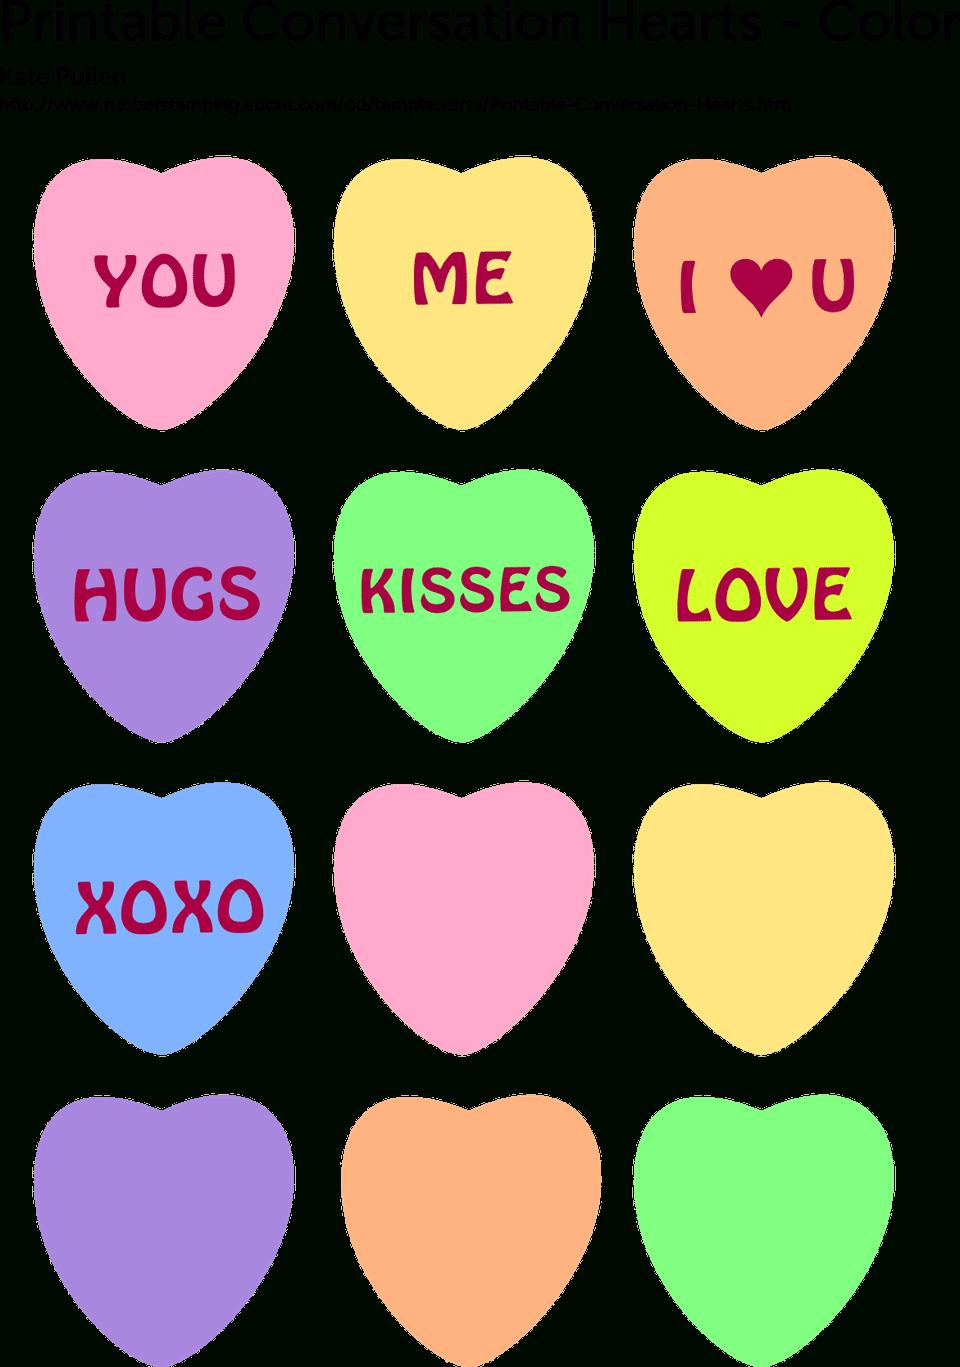 6 Free Printable Heart Templates | Valentine Ideas | Pinterest - Free Printable Valentine's Day Stencils